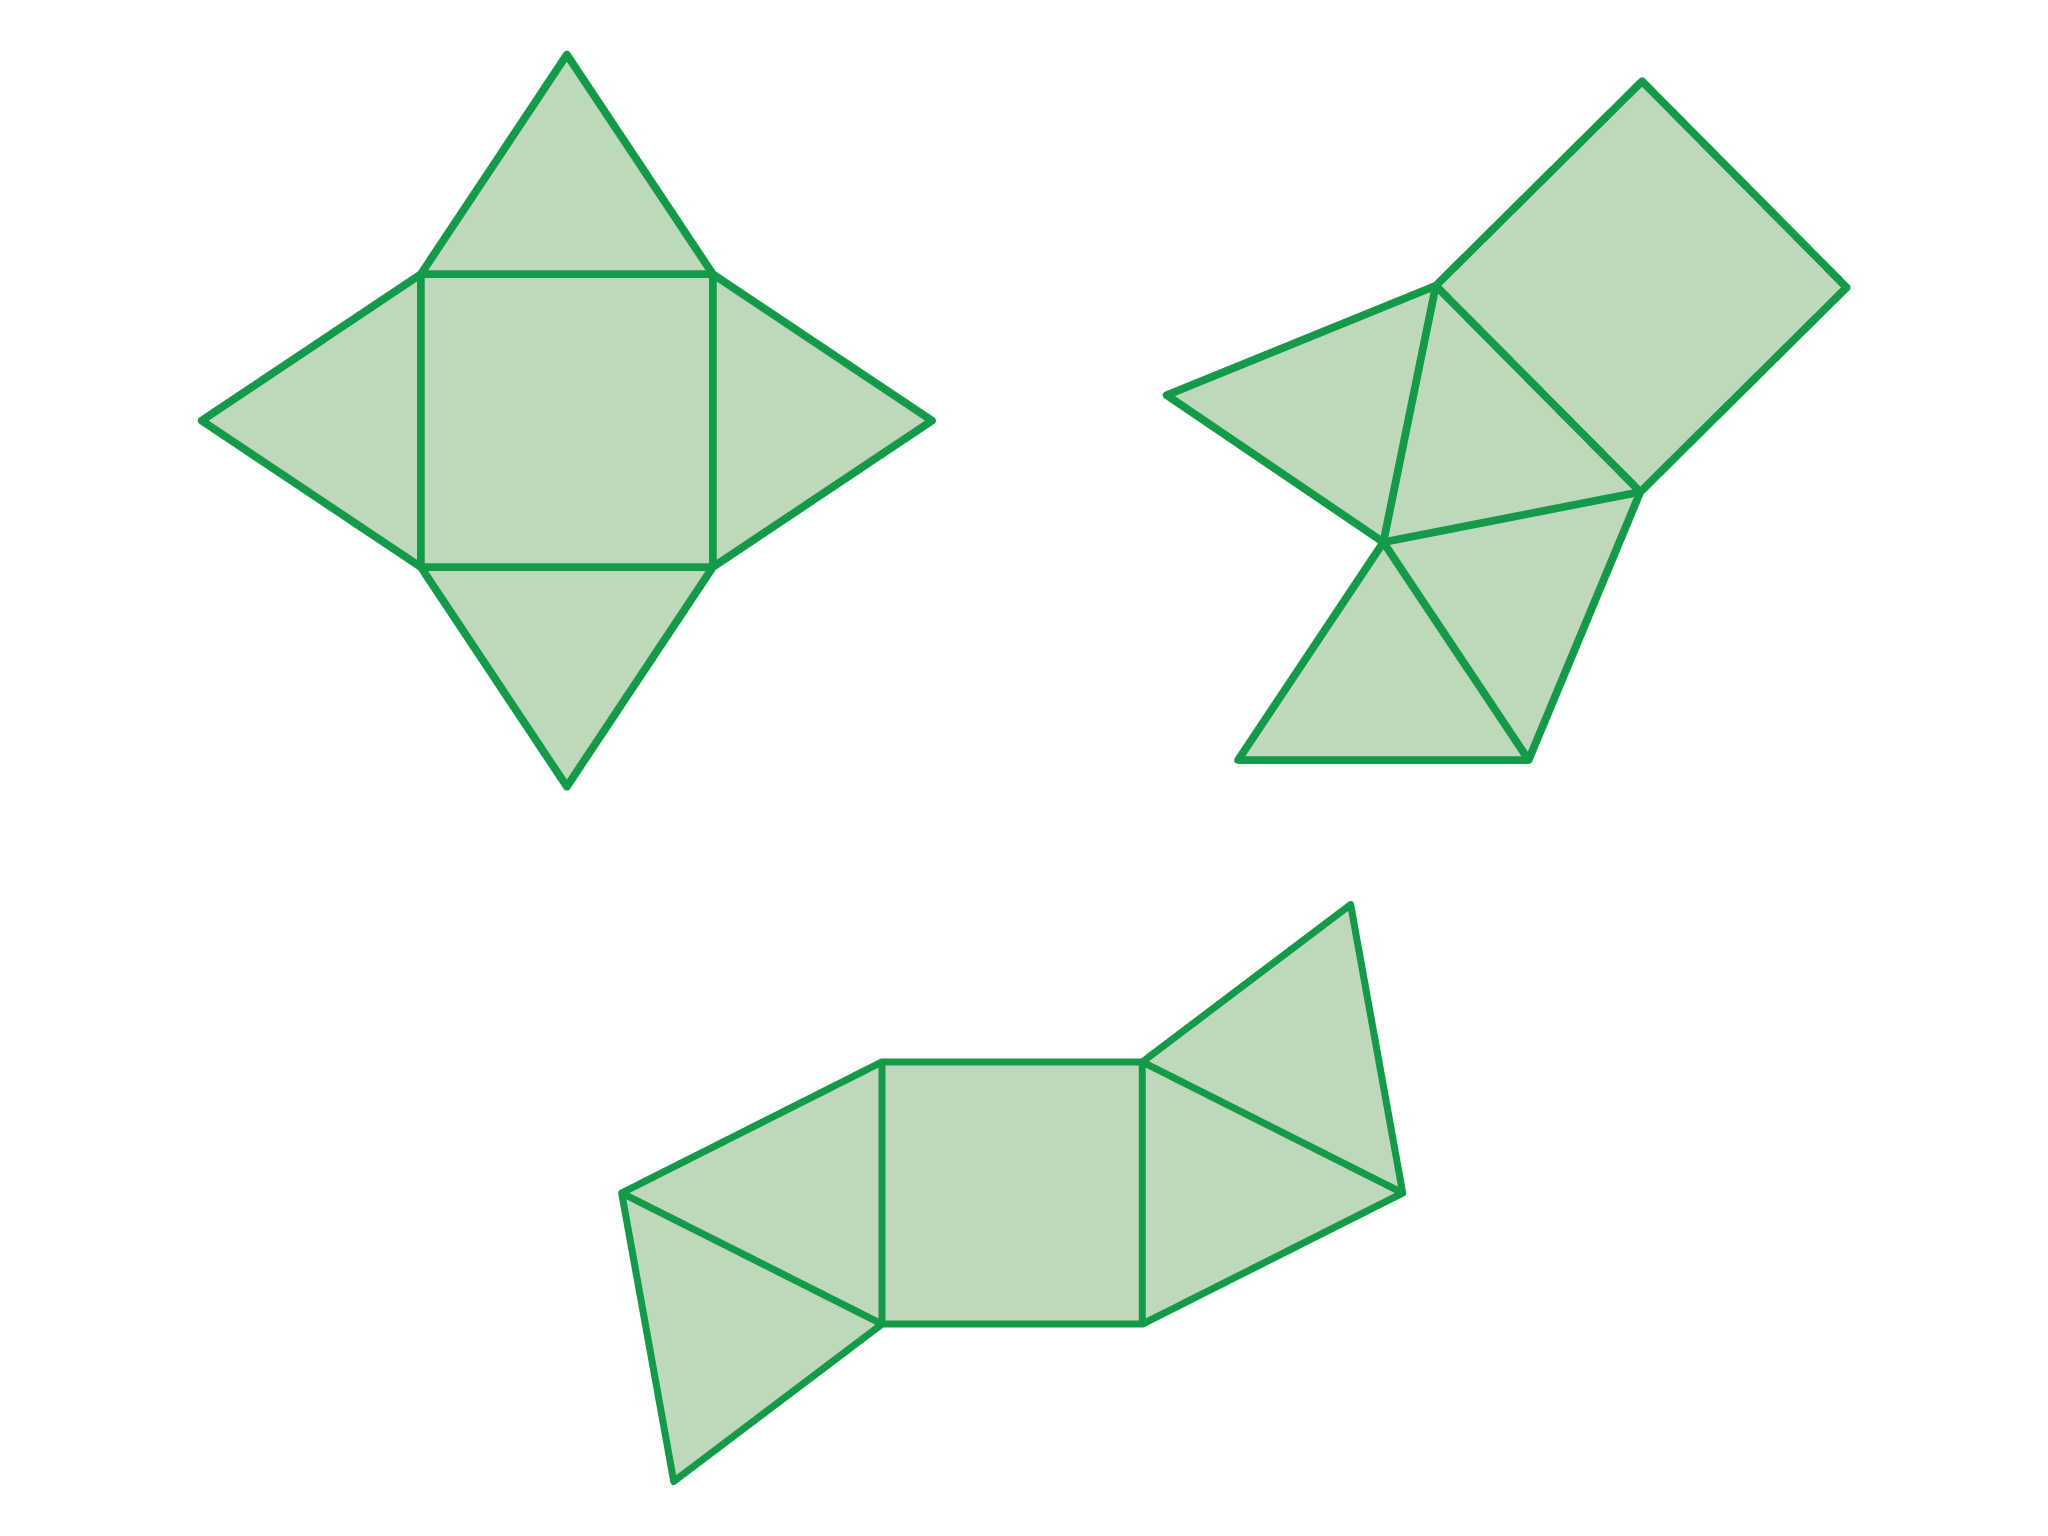 Drawn pyramid square base Most the considering similar Unit